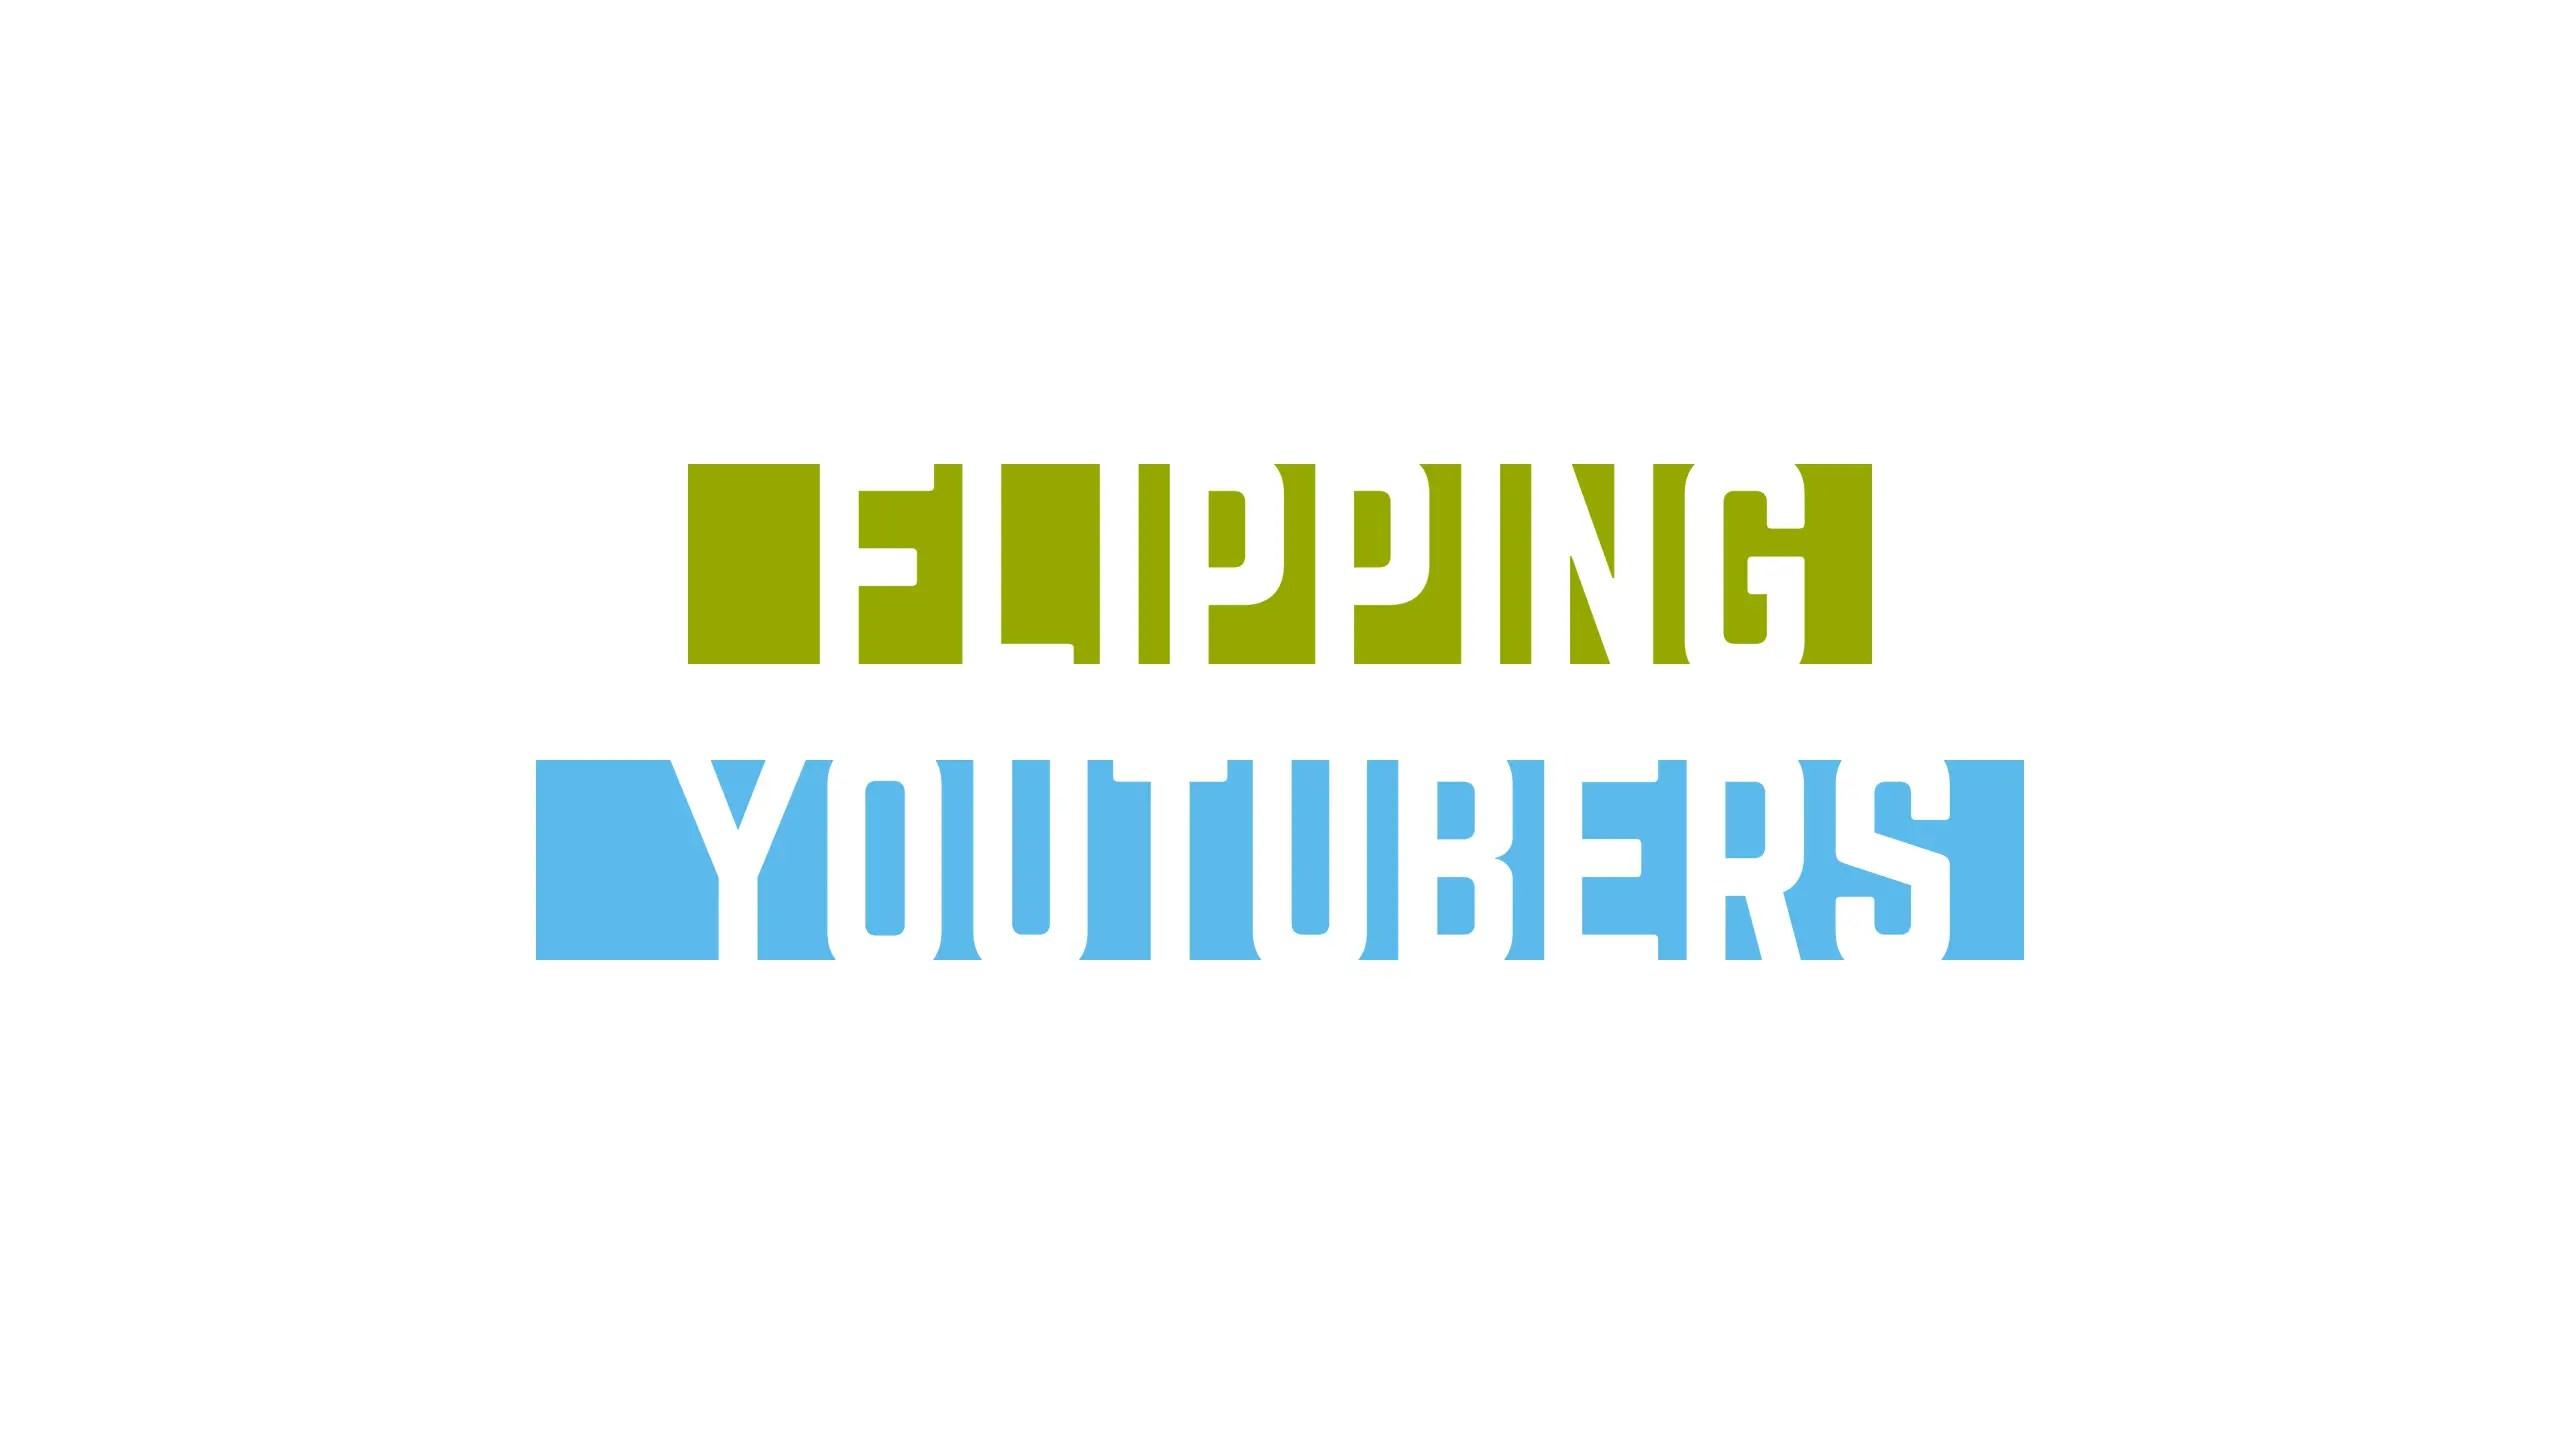 Thrift Store flipping Youtube